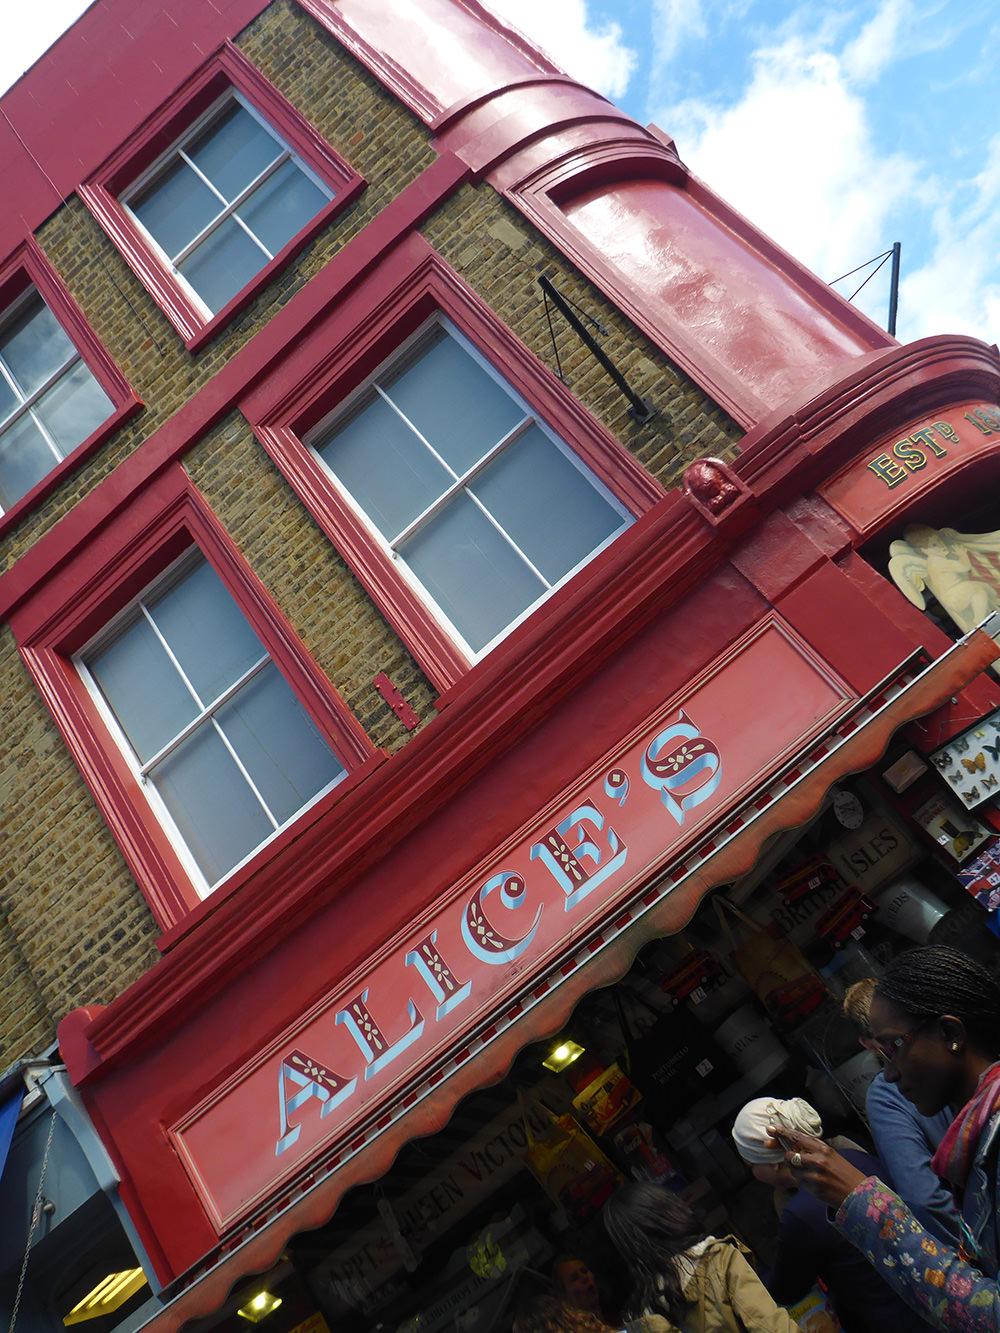 Les jolies façades du Marché de Portobello, Notting Hill, Londres